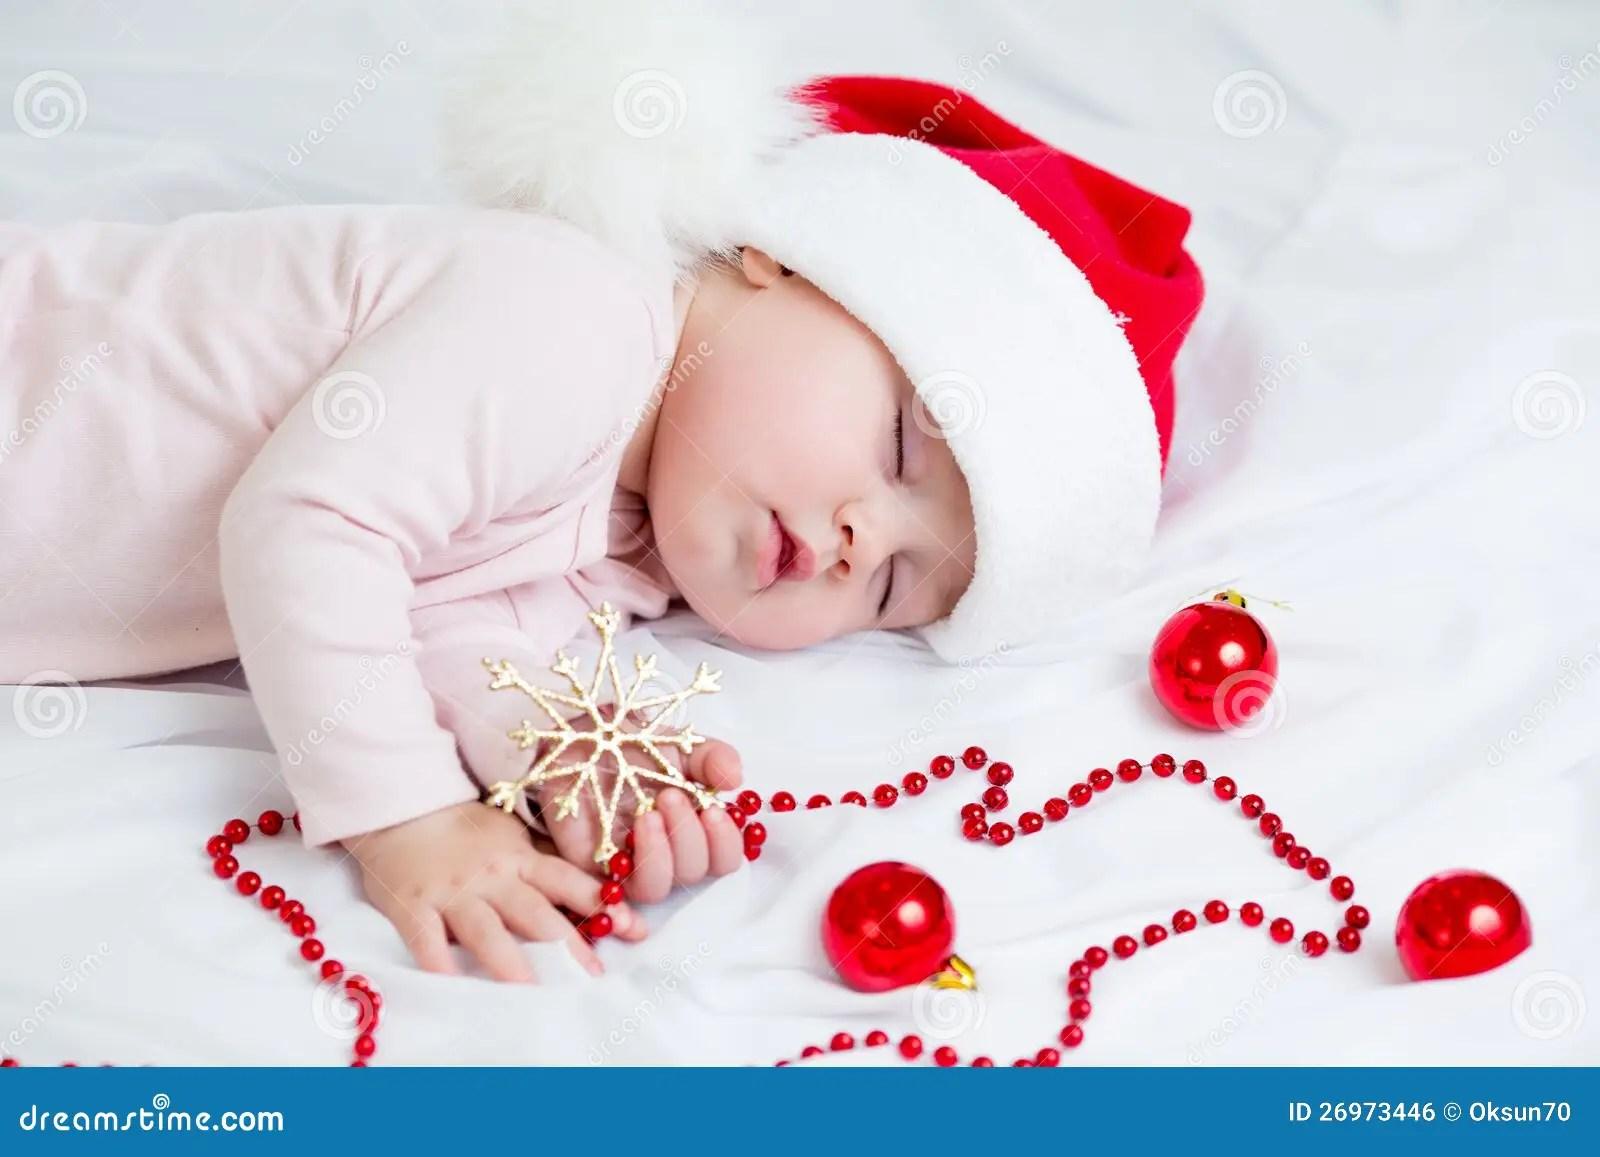 Cute Girl Child Wallpapers Free Download Sleeping Sweet Baby Girl Santa Claus Stock Photo Image